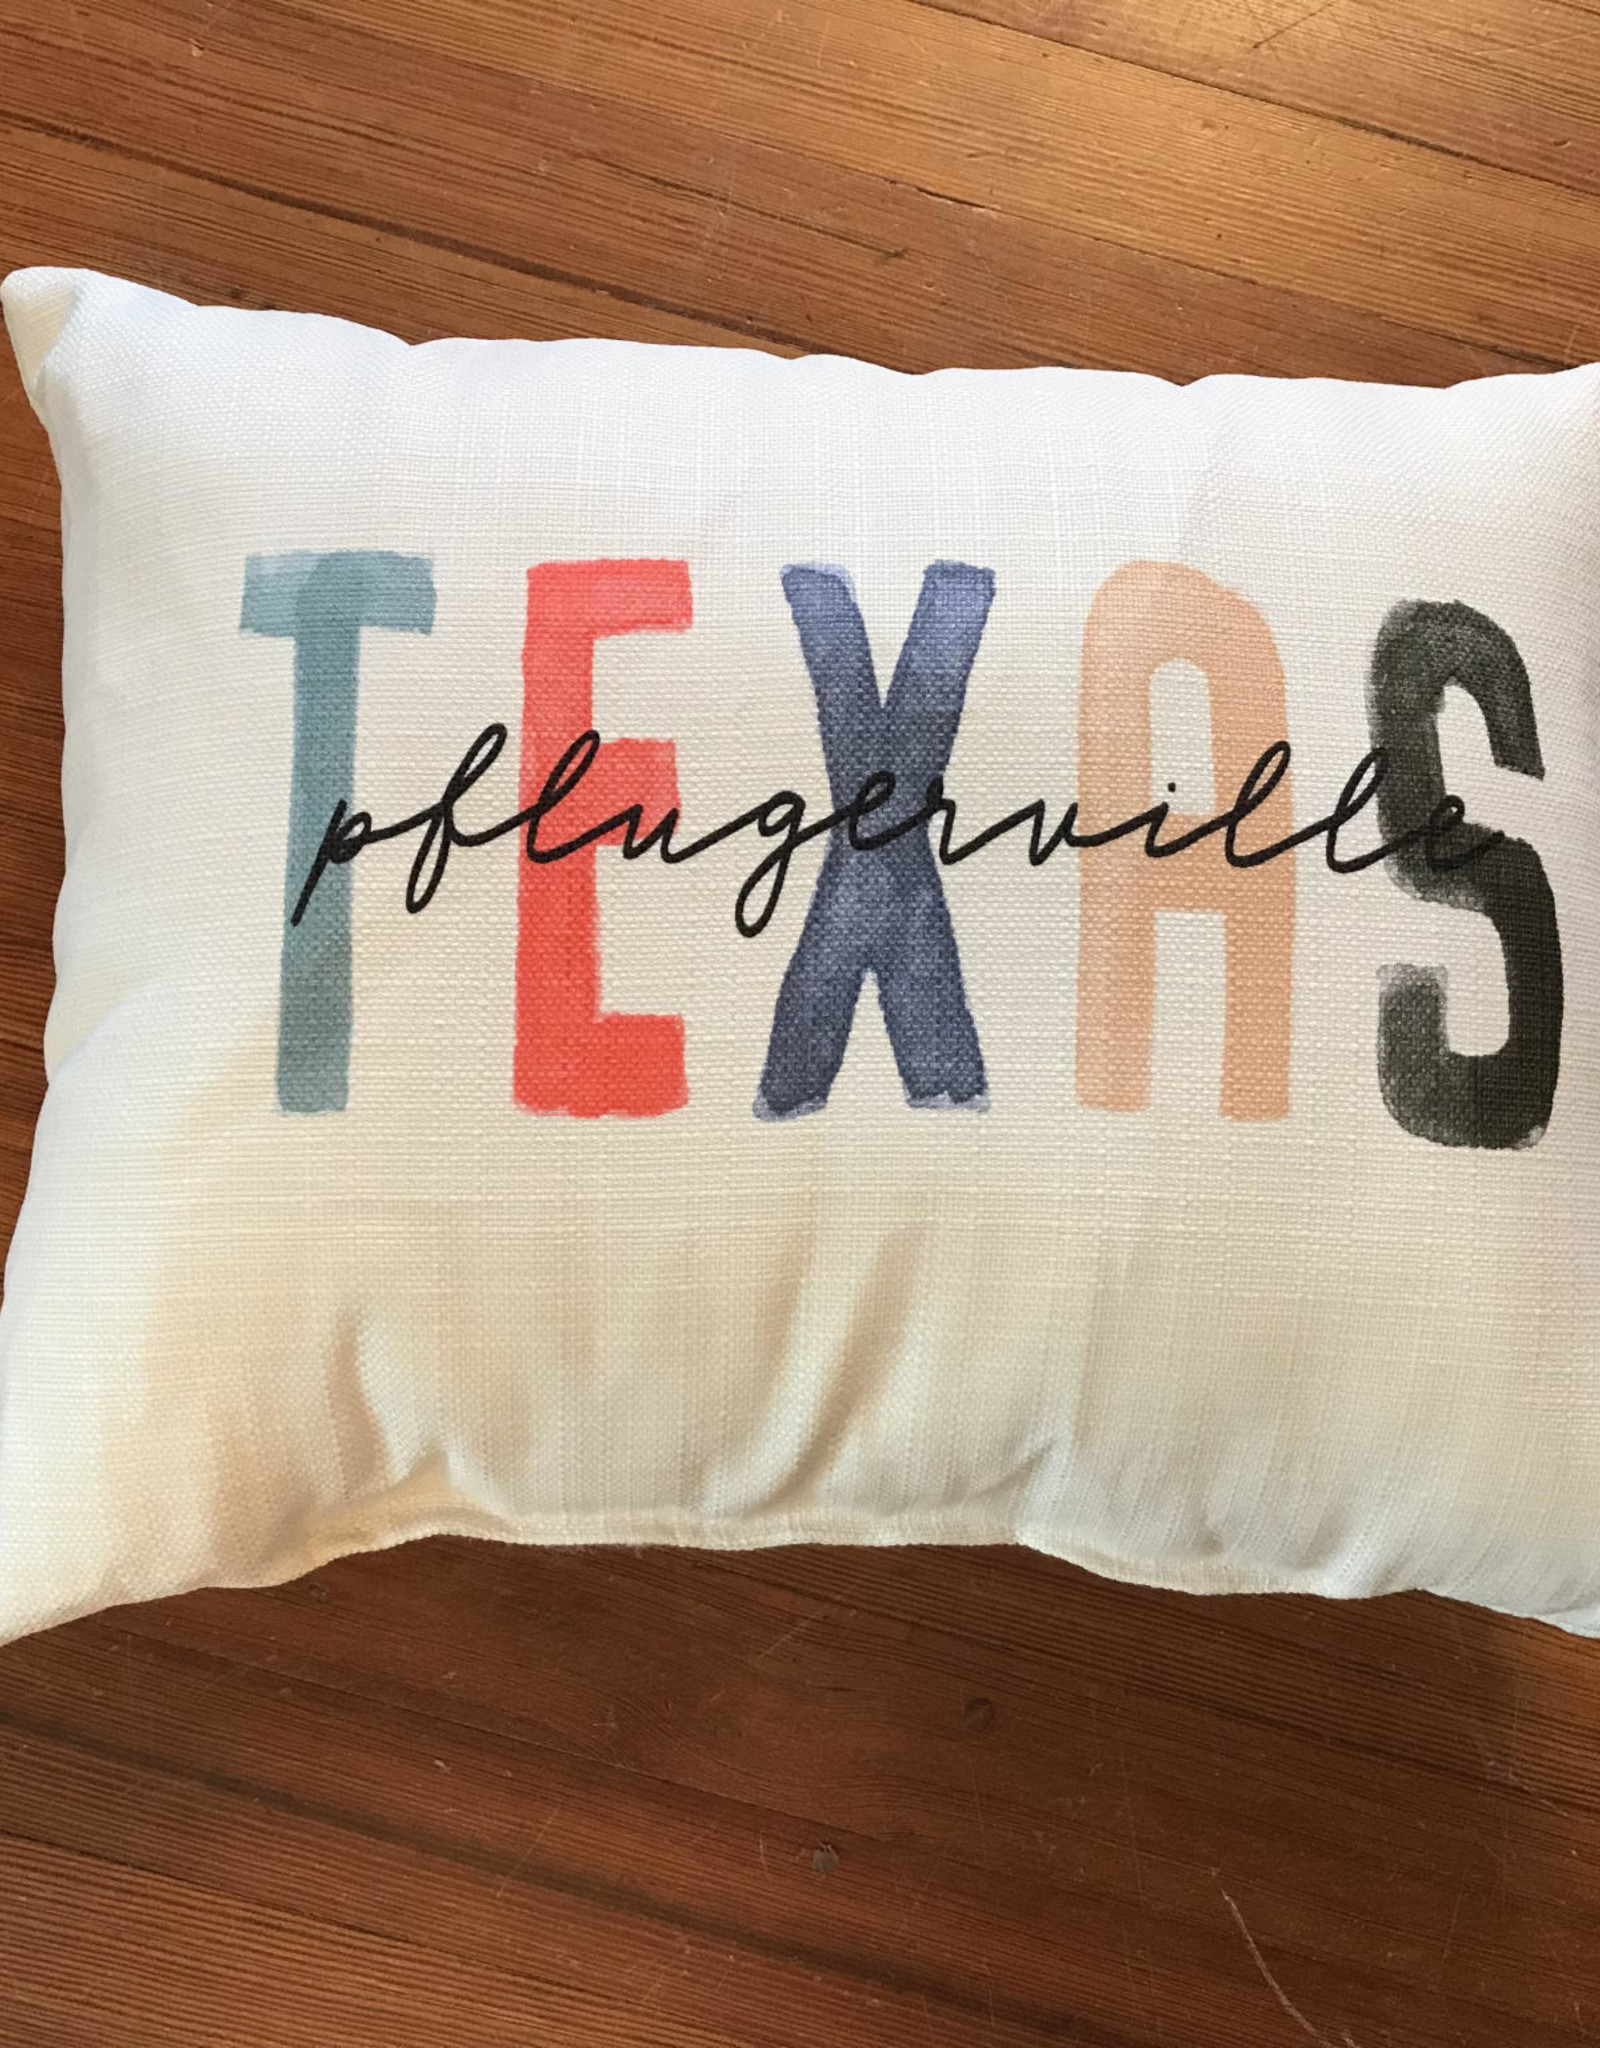 Wink Pflugerville Texas Pillow - Bright